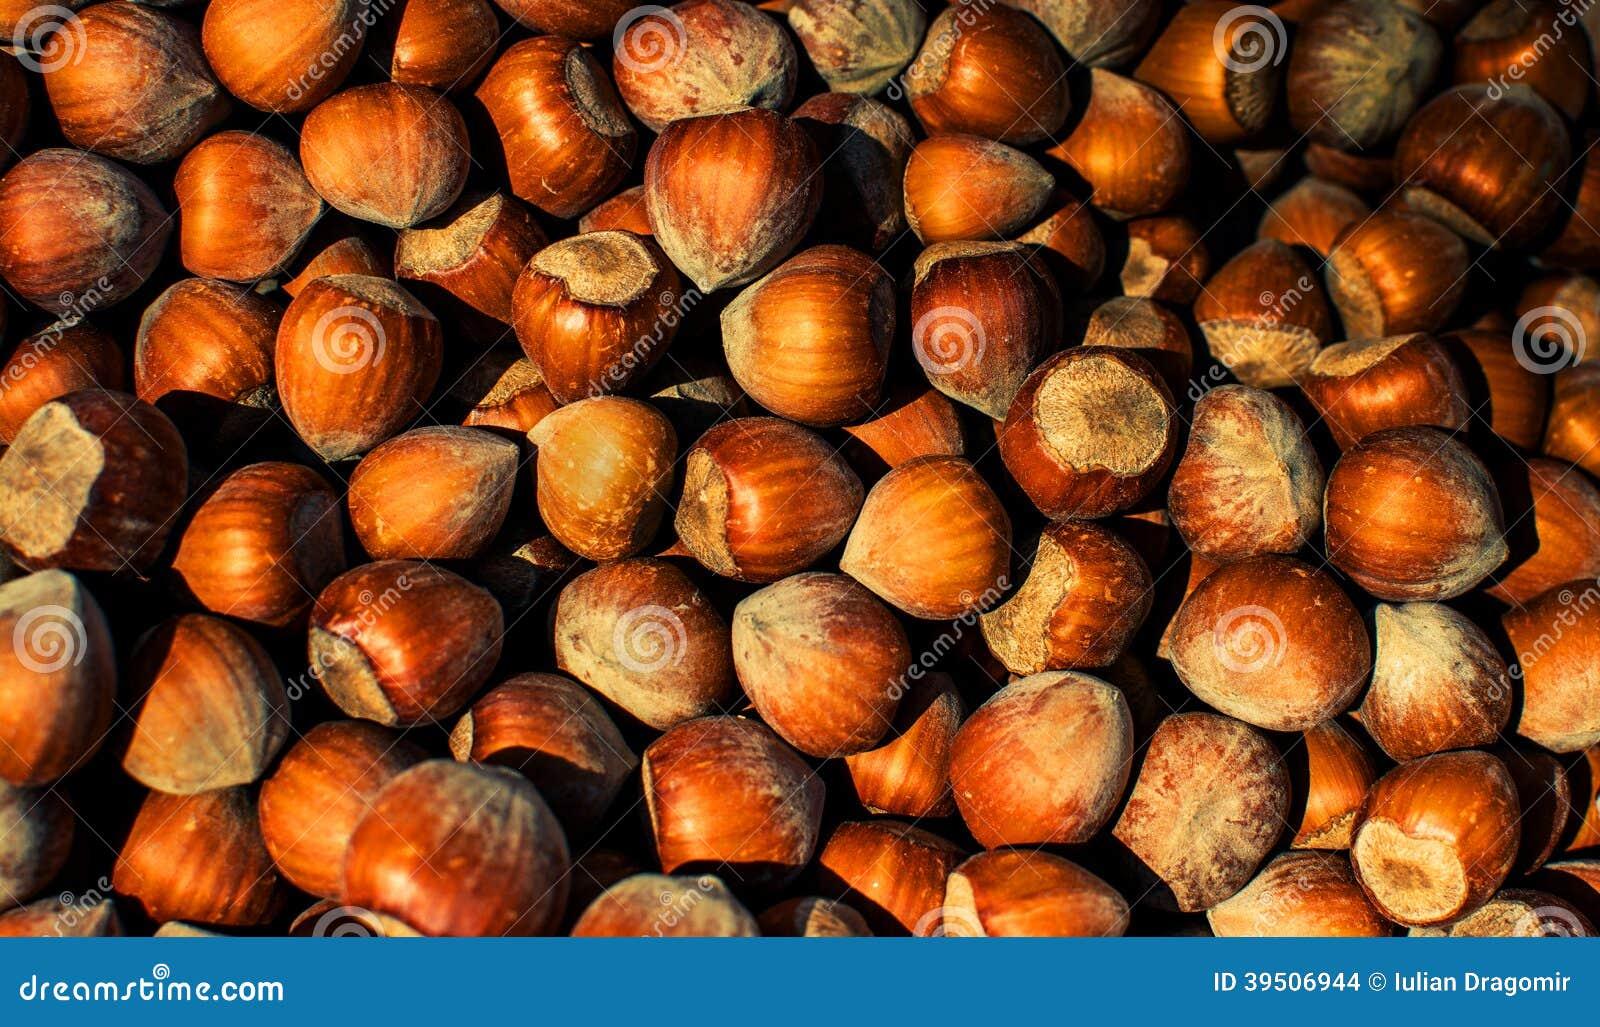 Hazelnuts Texture